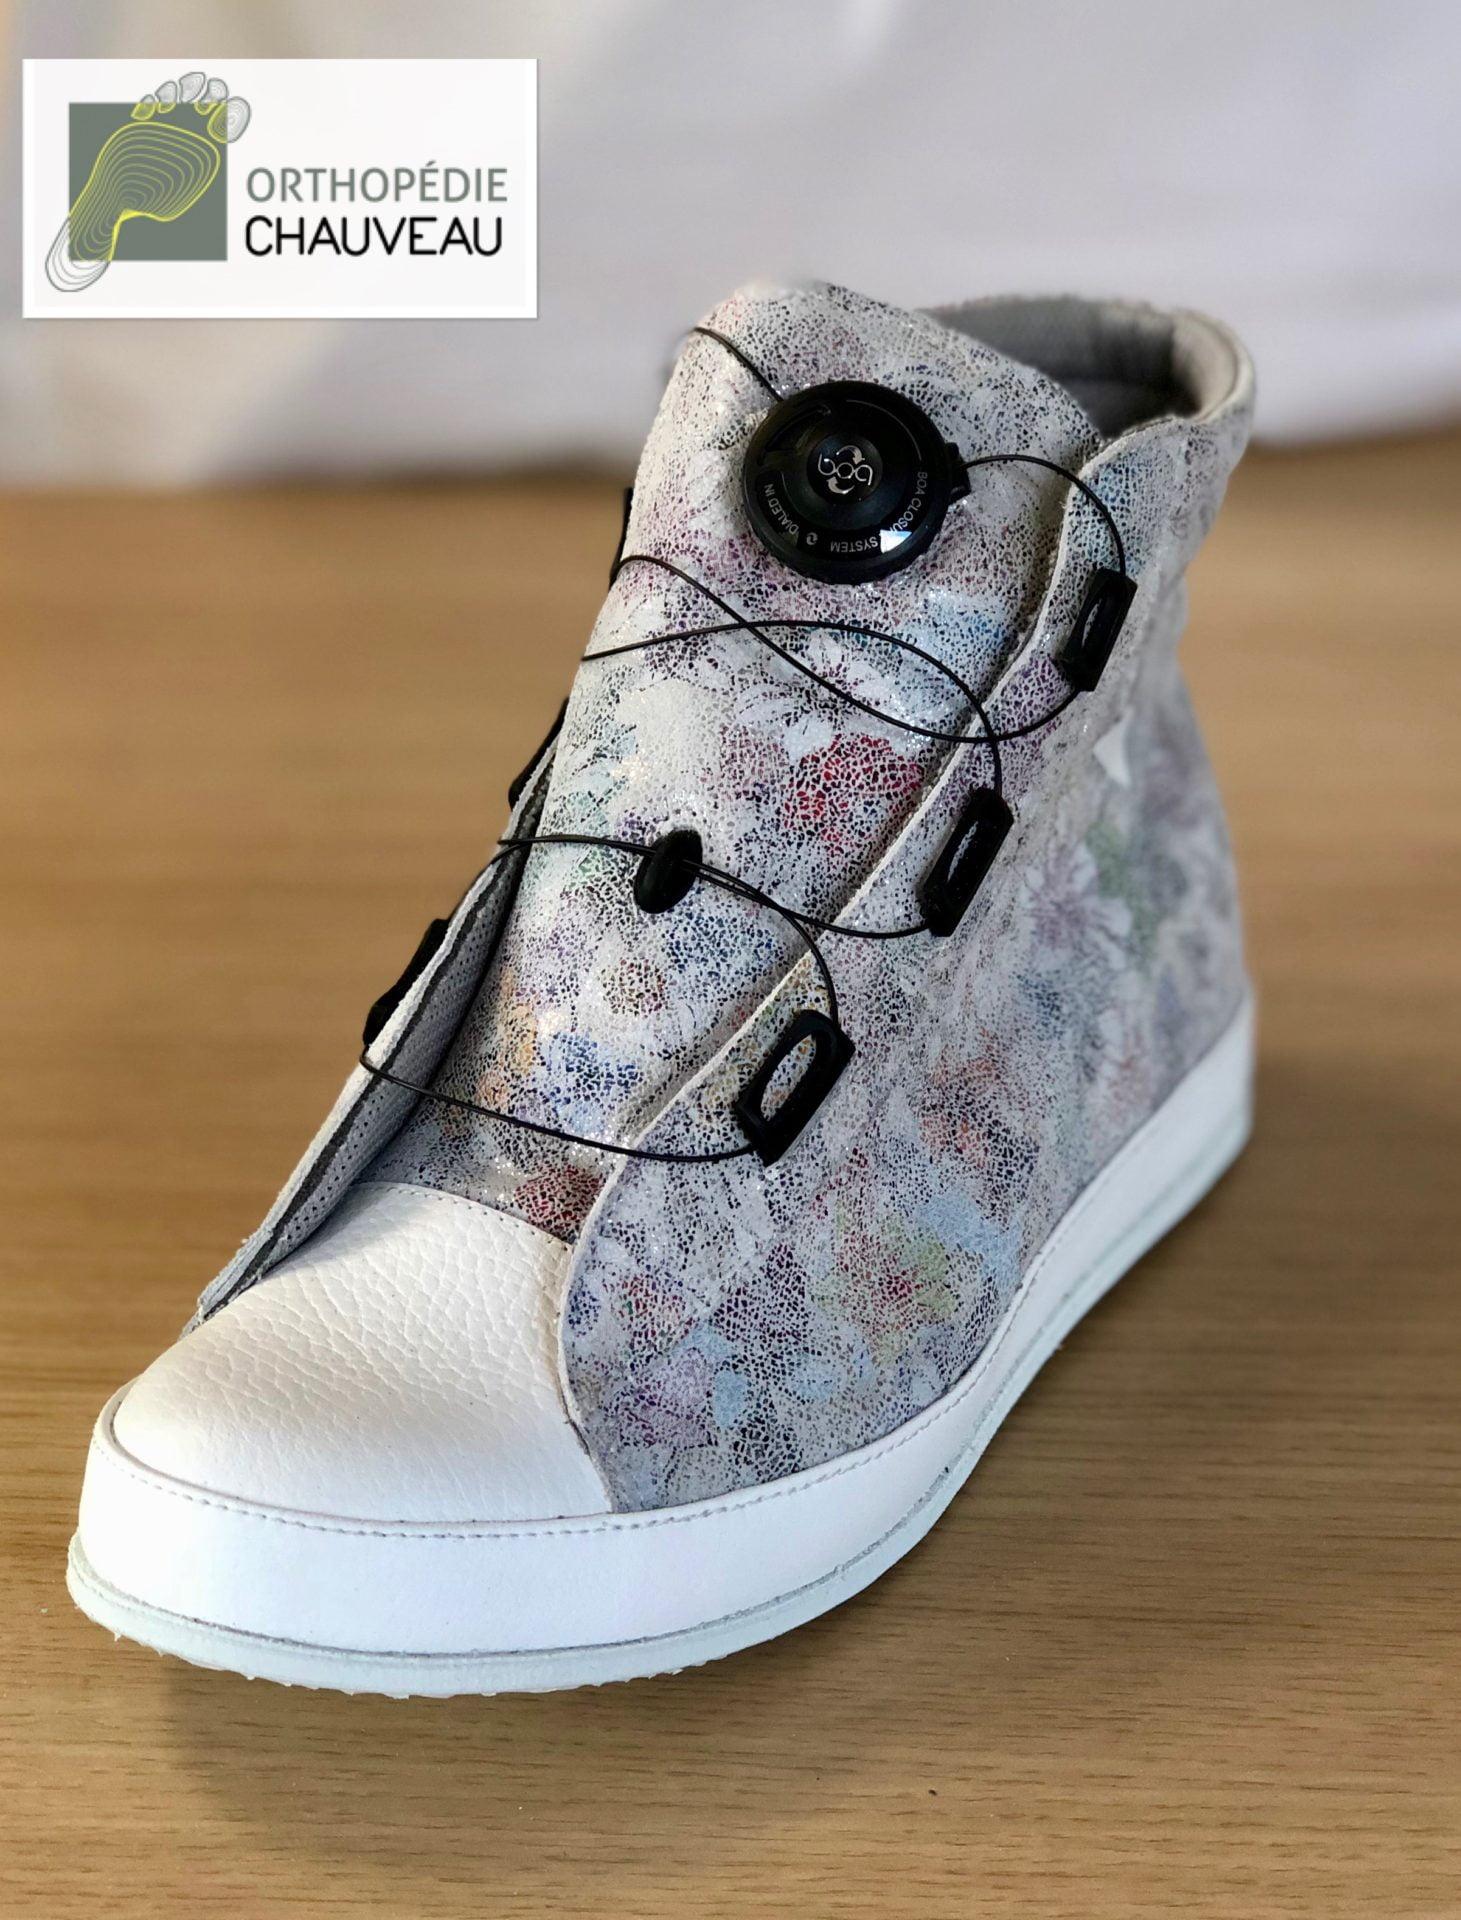 chaussures orthopediques Rennes fermeture une main